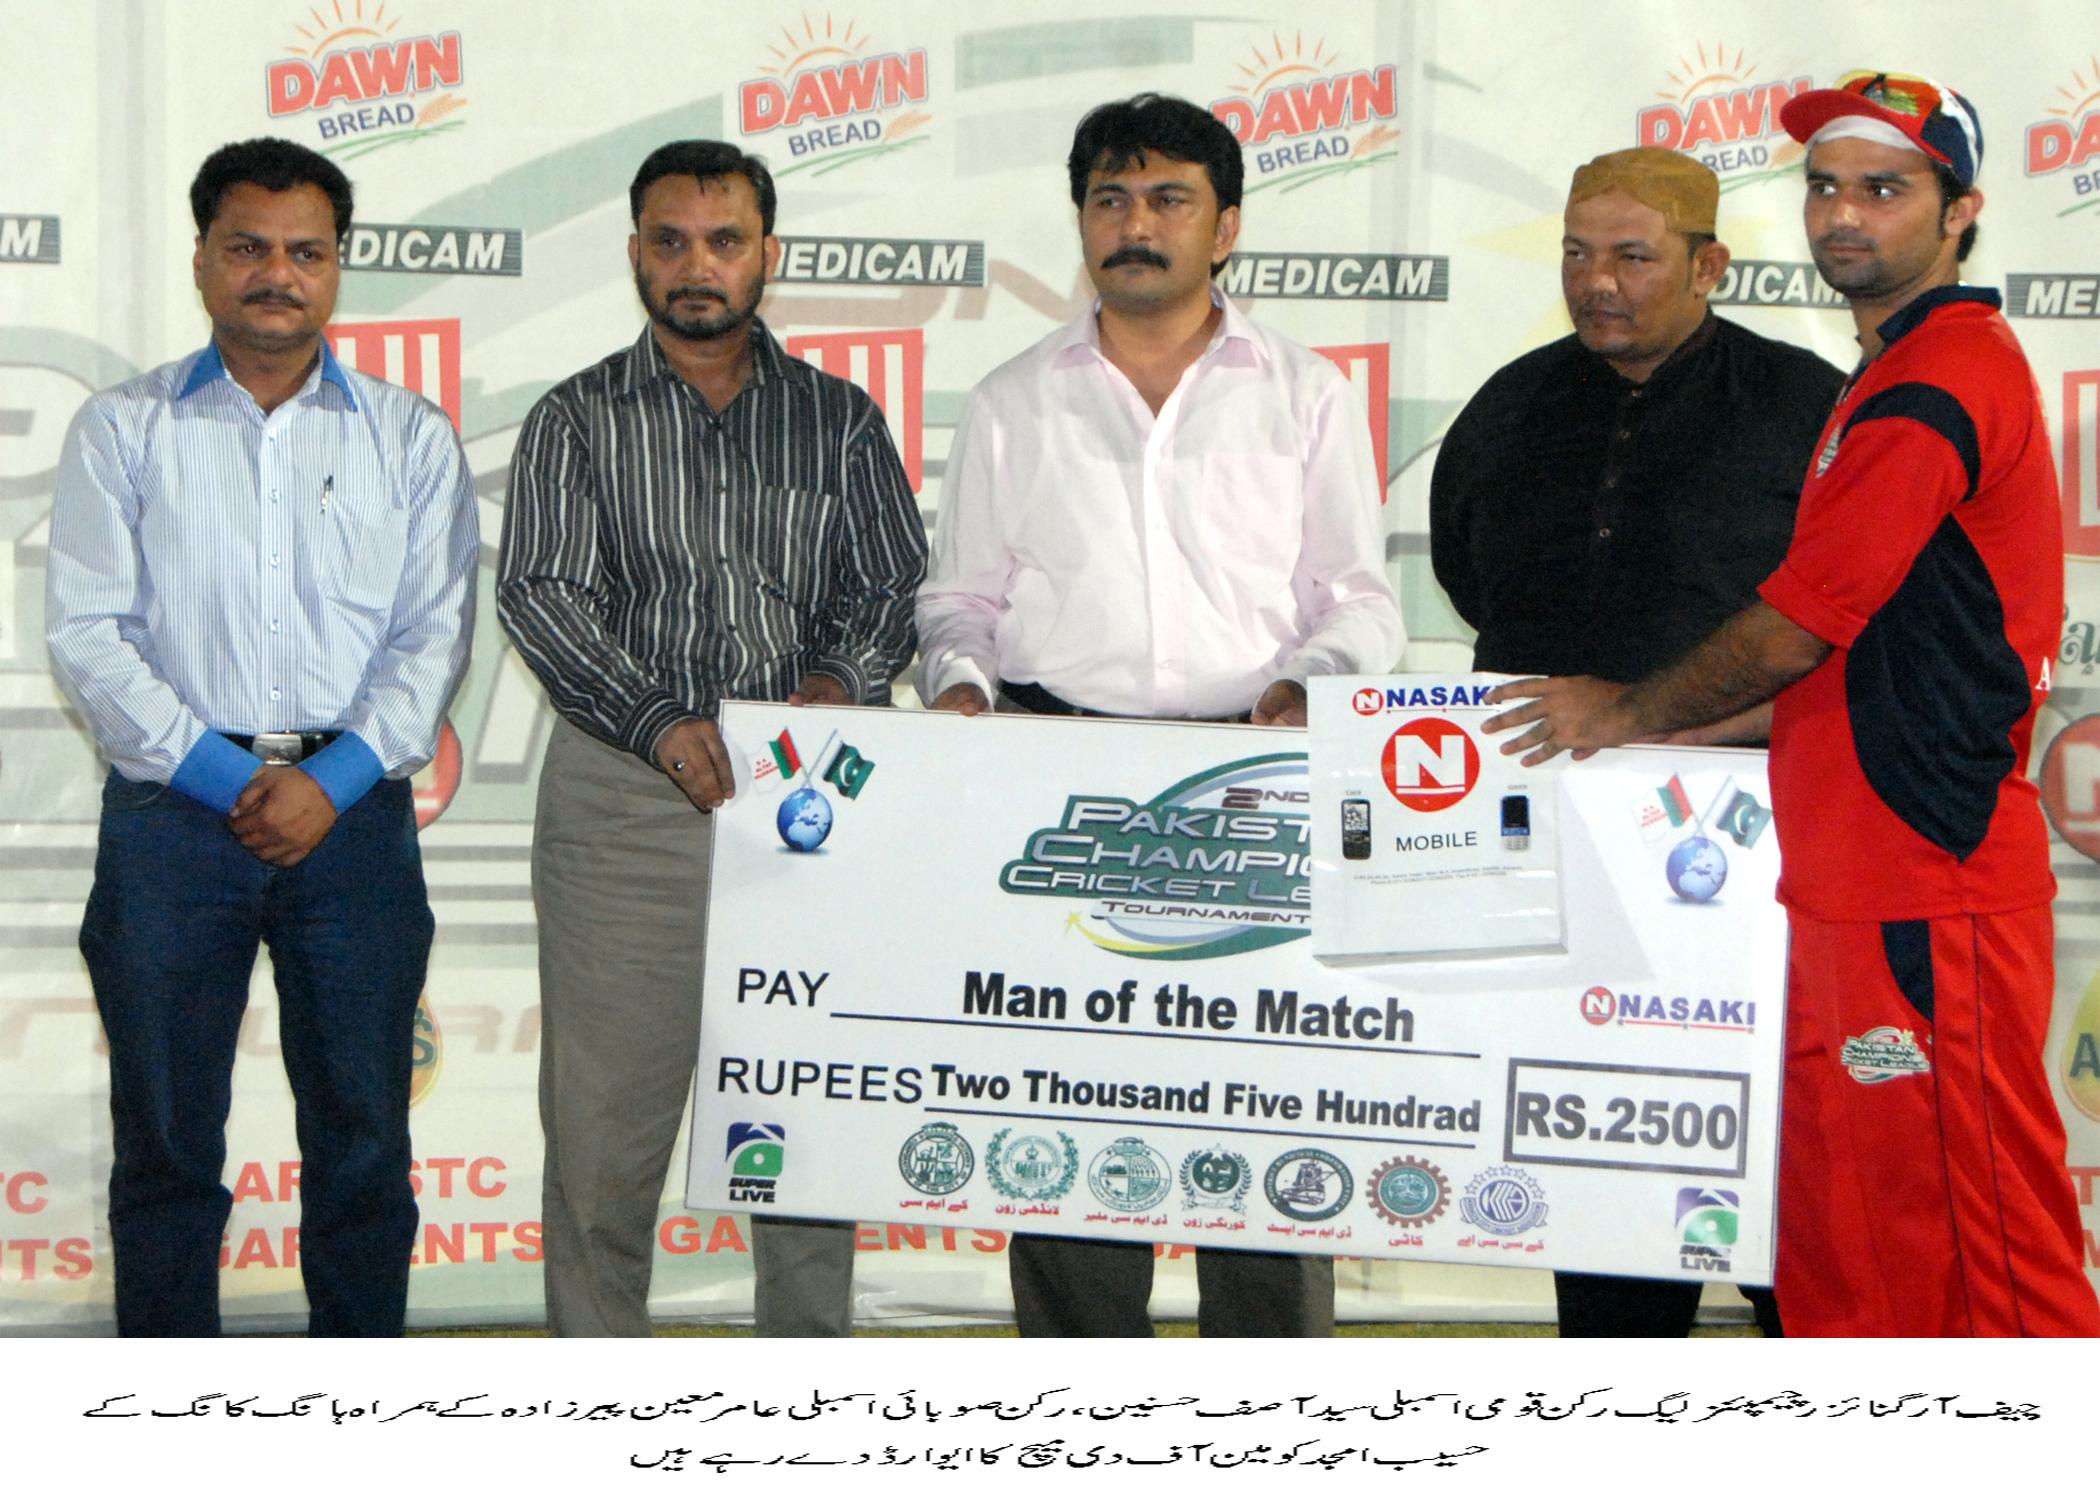 Pakistan Champions Cricket League – PCCL, Matches Results